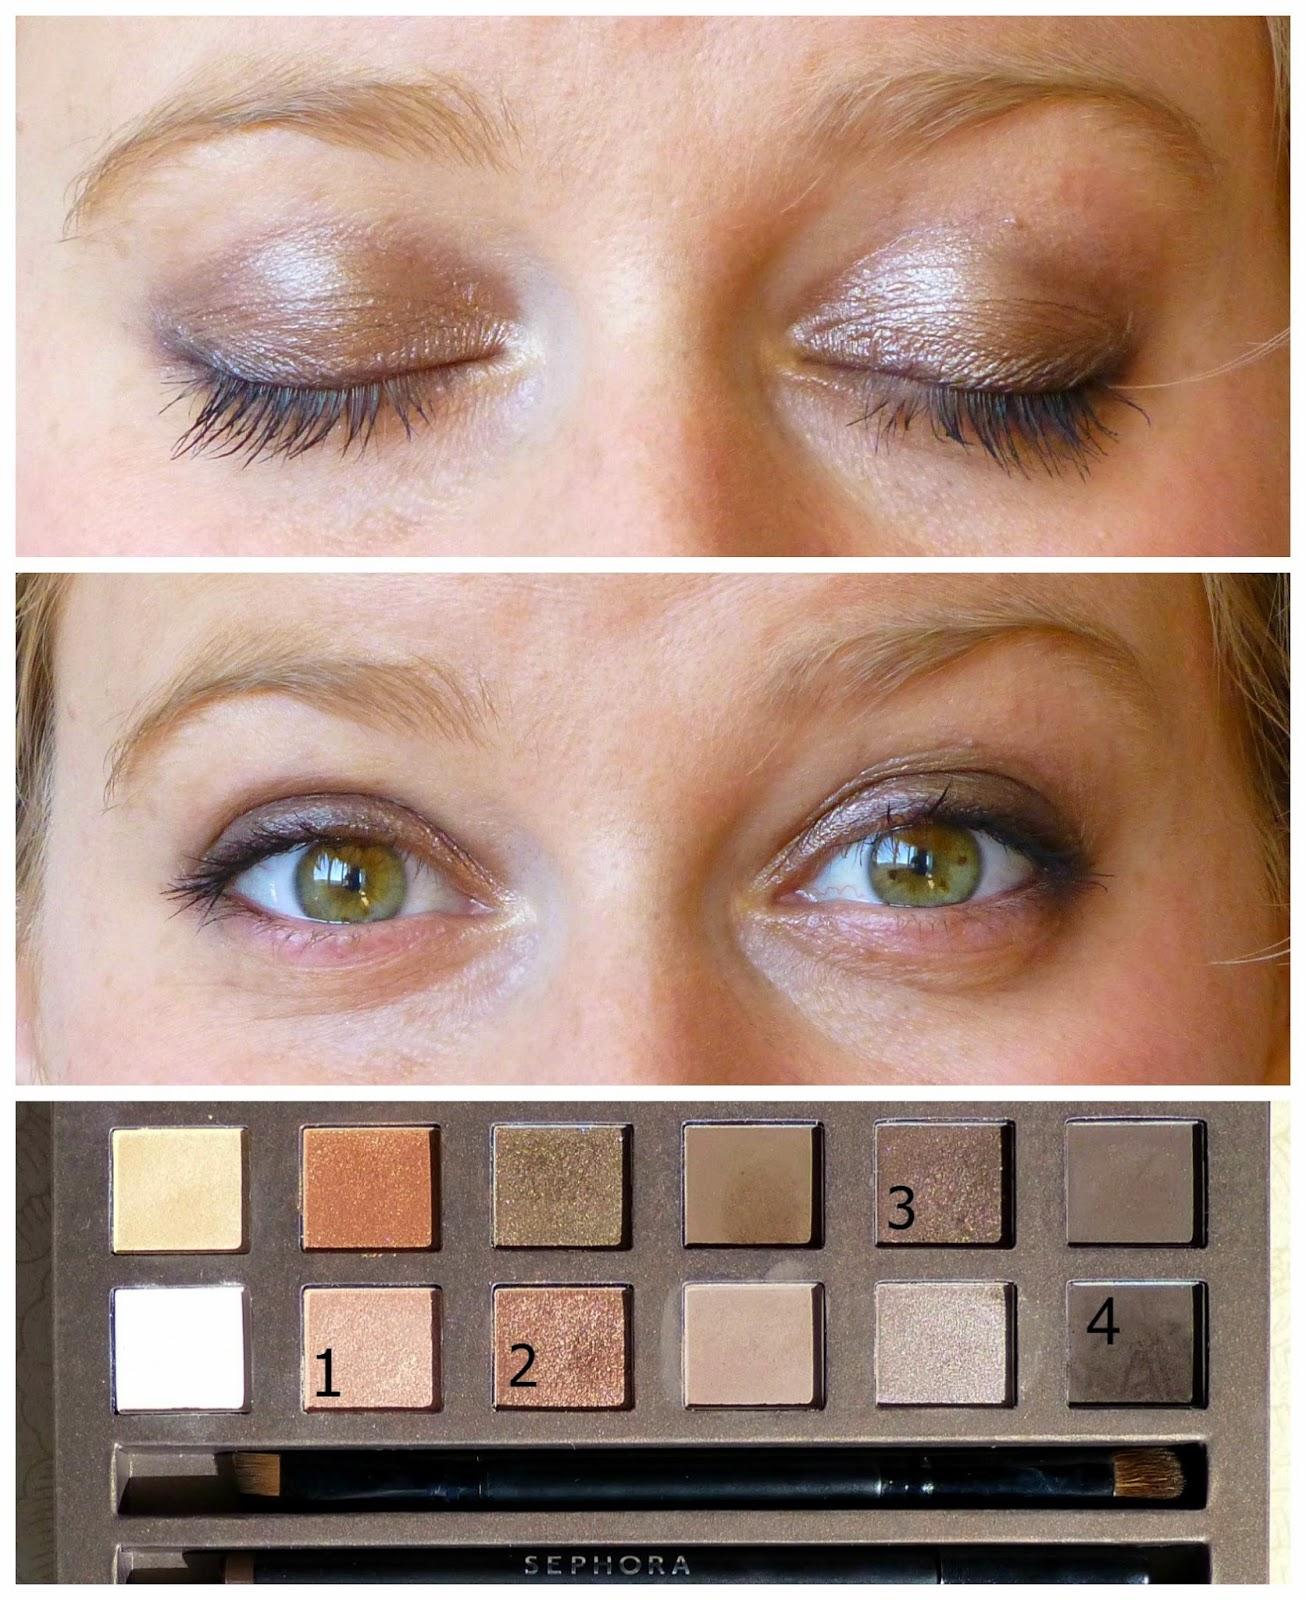 maquillage nude chic gr ce la it palette sephora superfici 39 elle. Black Bedroom Furniture Sets. Home Design Ideas